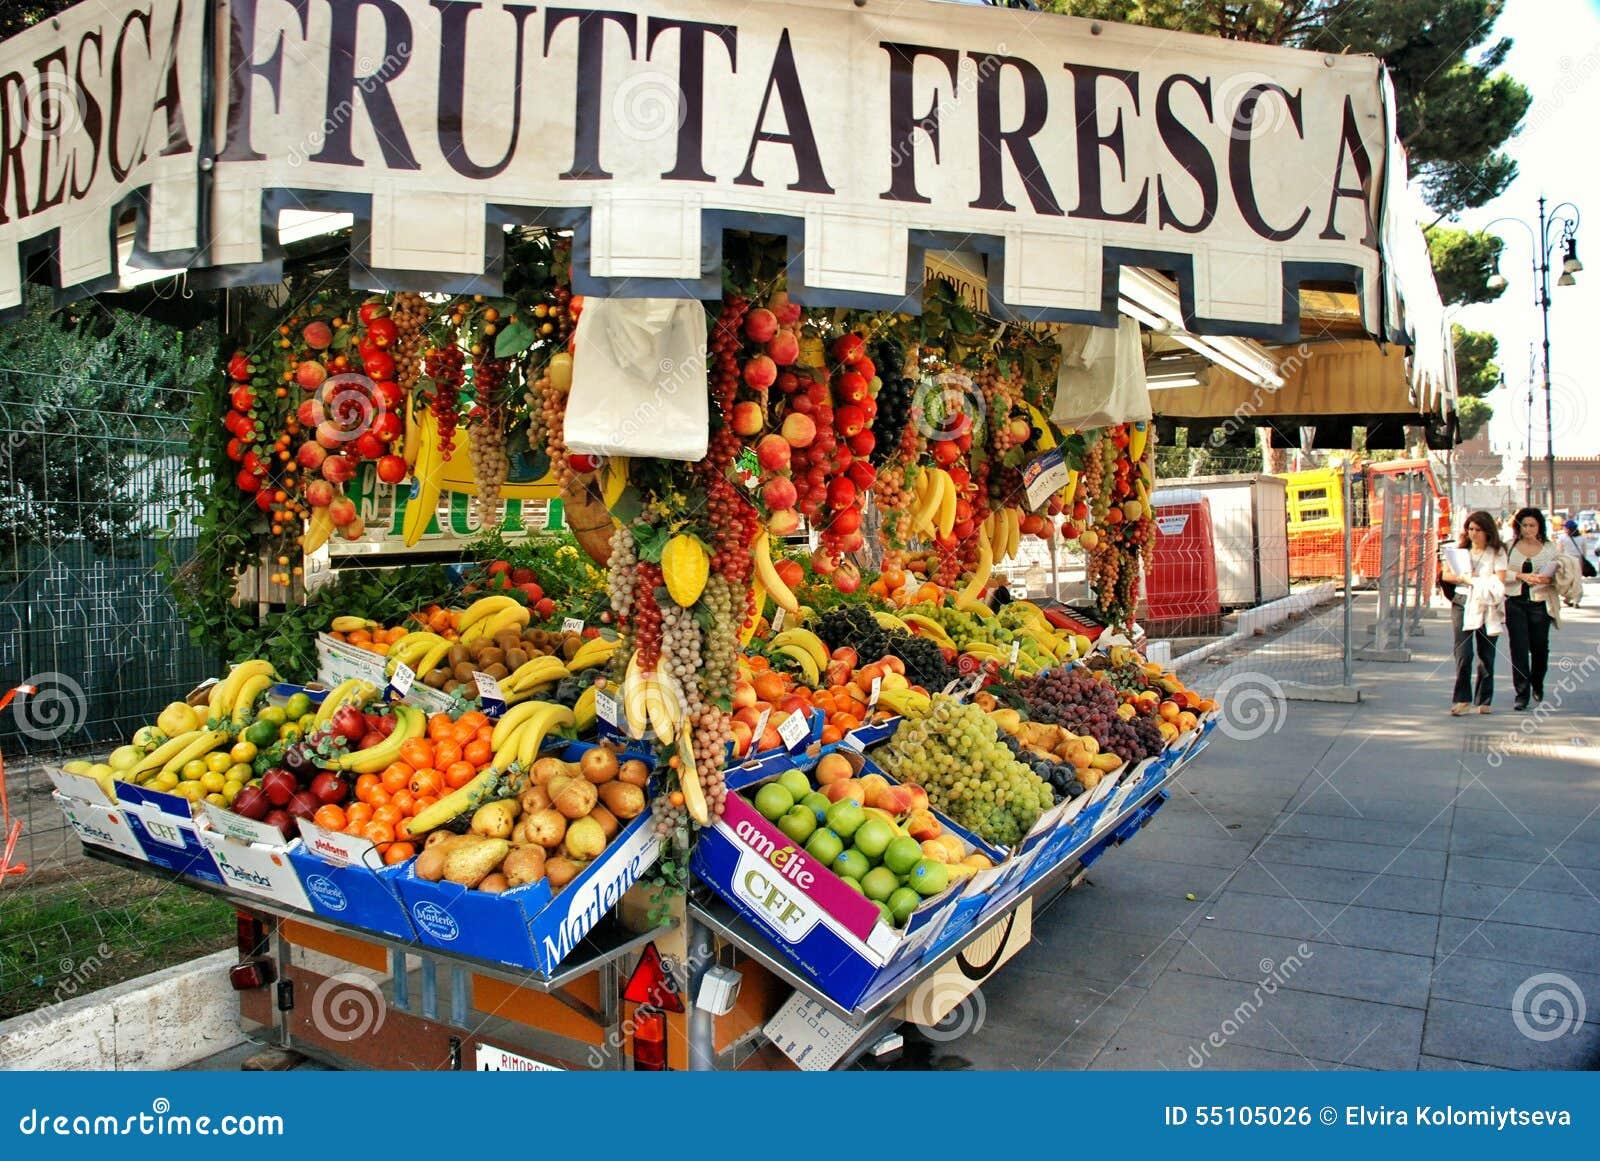 Fruittribune in Rome